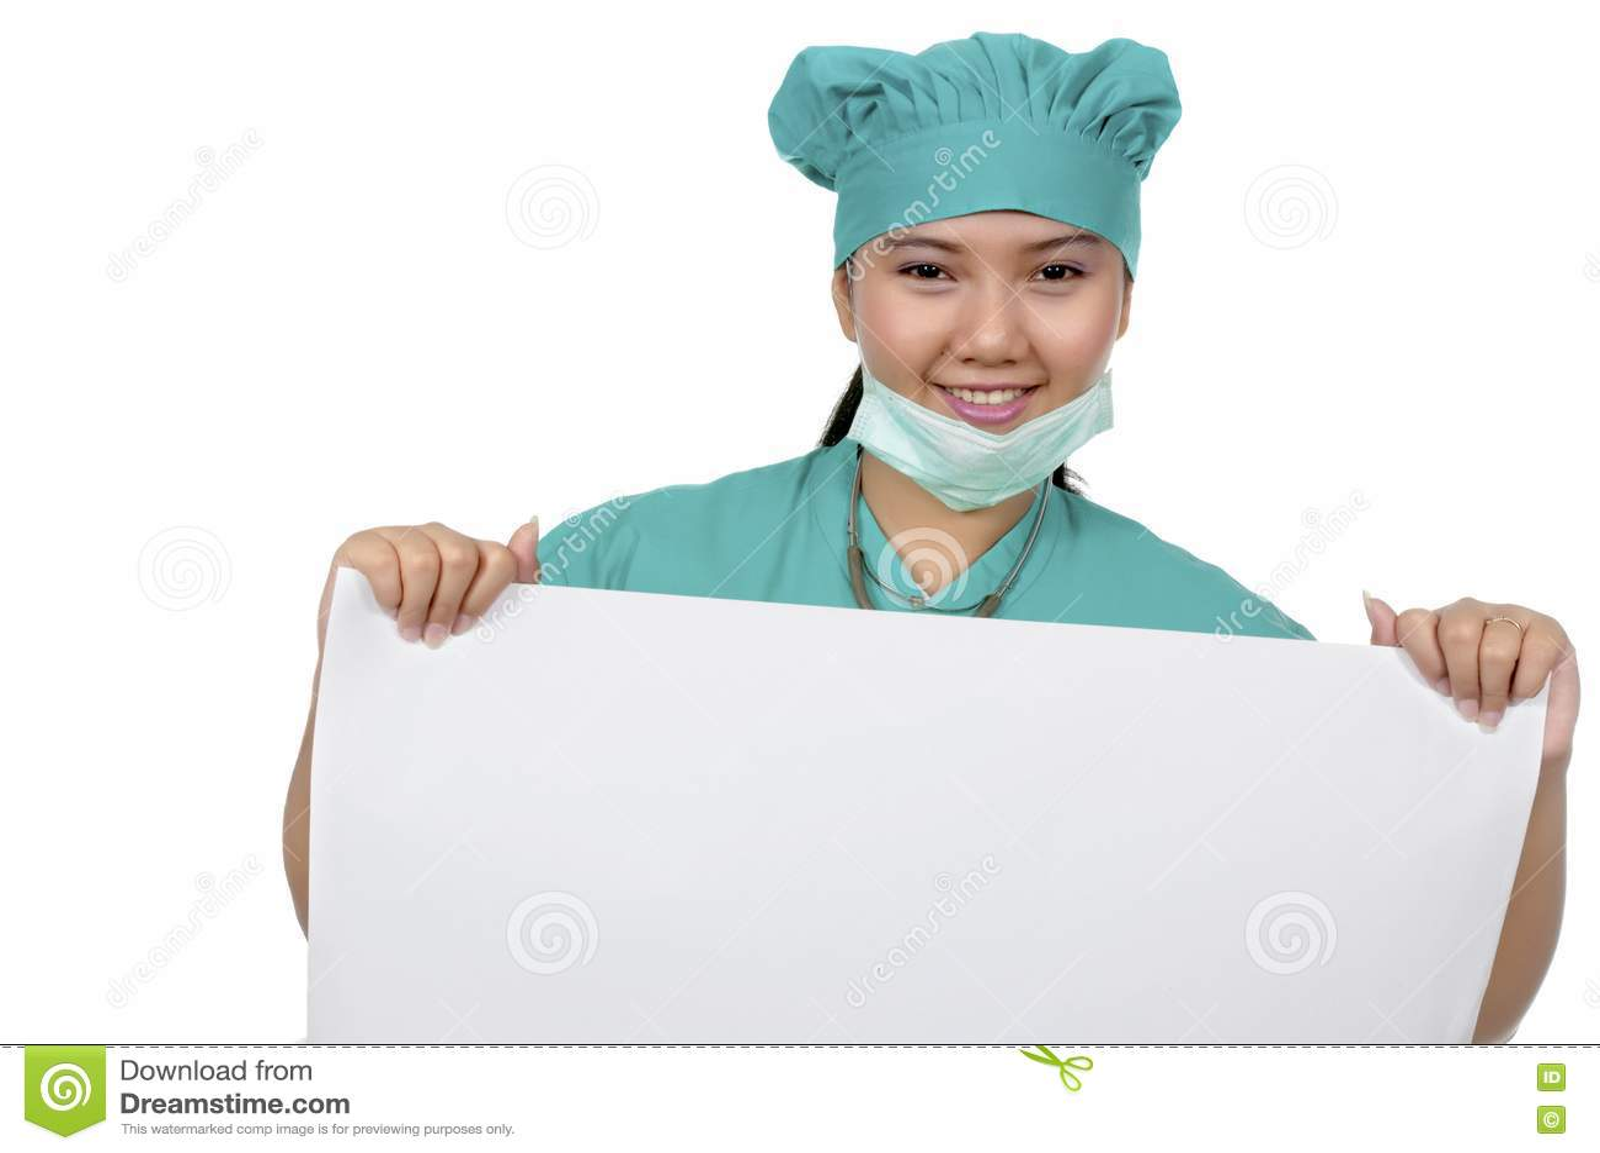 how to put kijiji ad on hold